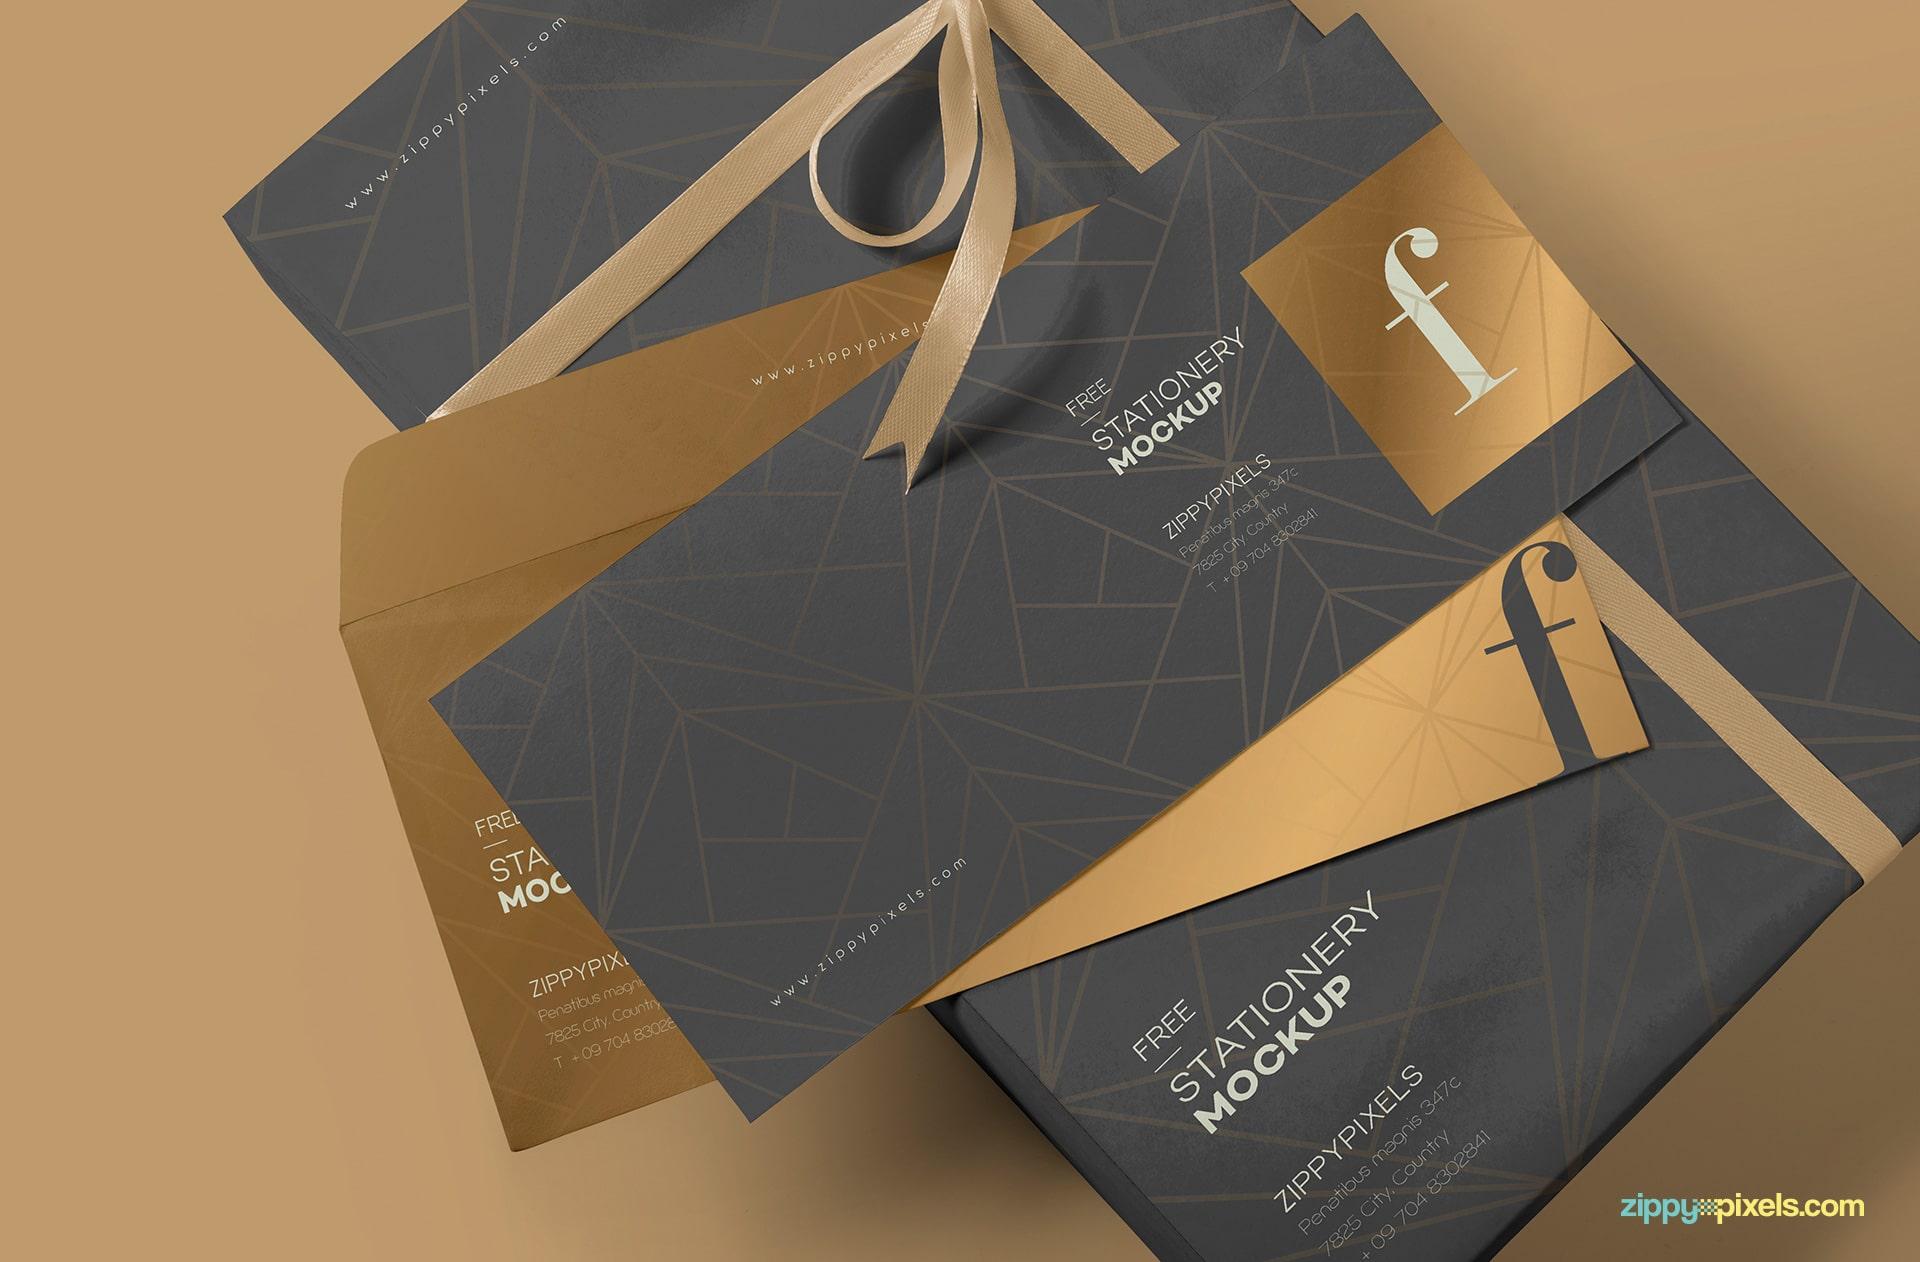 Envelope Psd Mockup Available In Wonderful Design